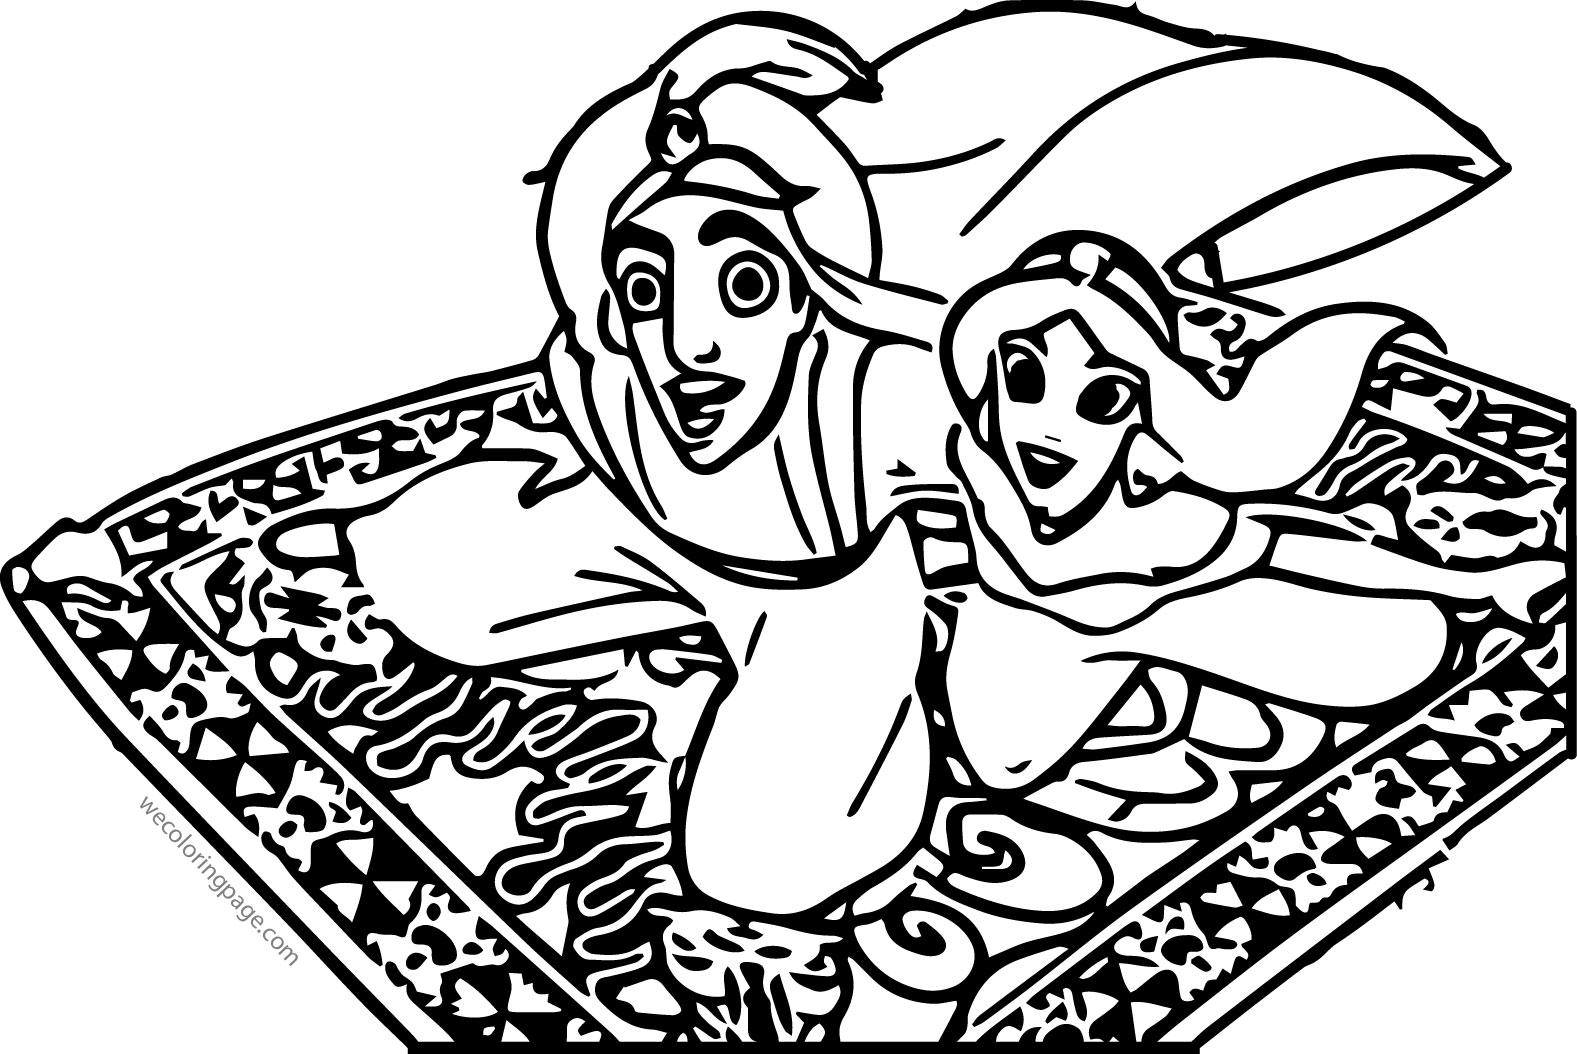 Walt Disney Prince Aladdin Walt Disney Characters Coloring Page  28